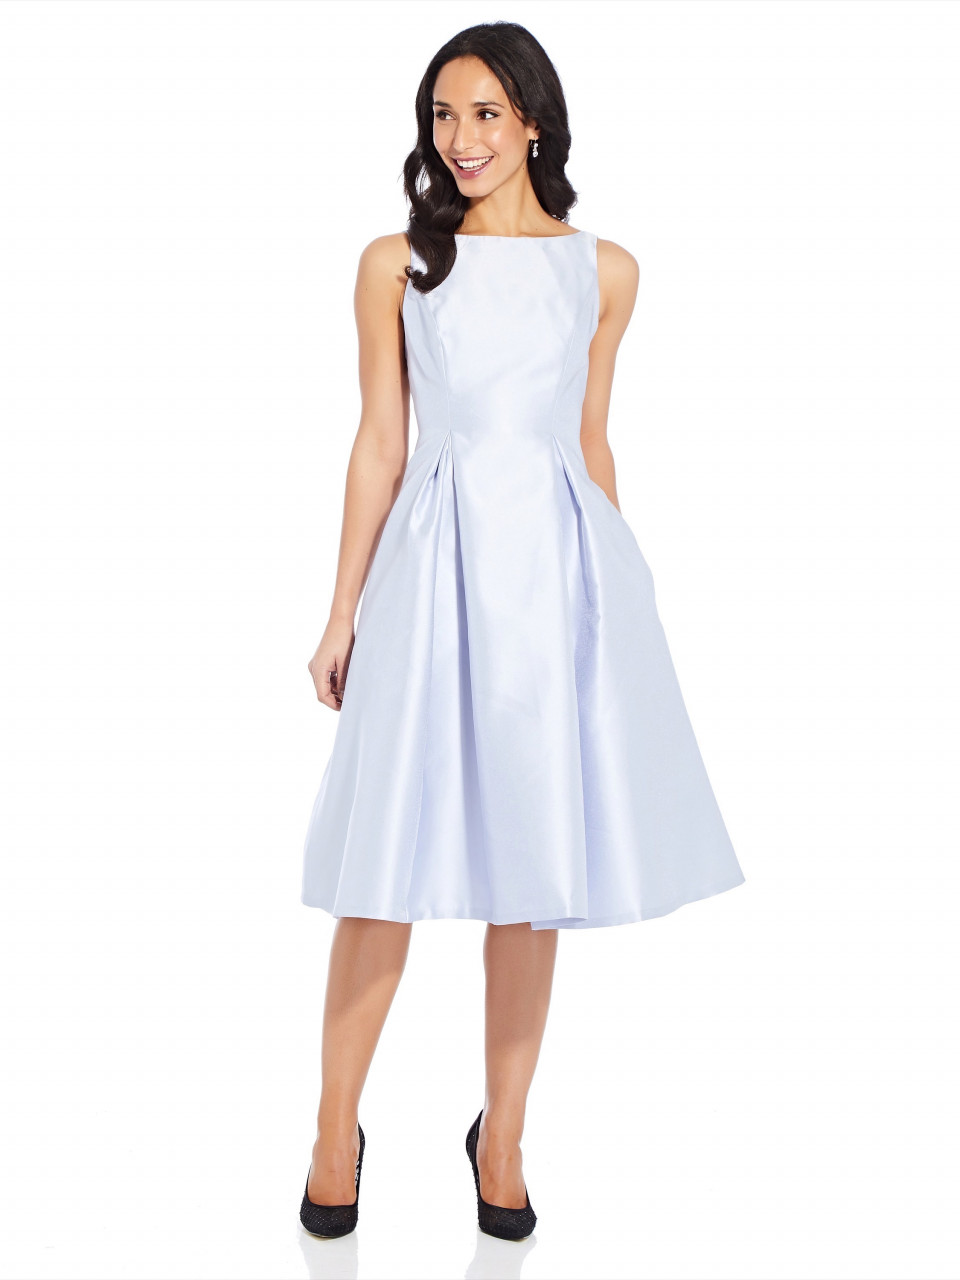 Sleeveless tea length dress